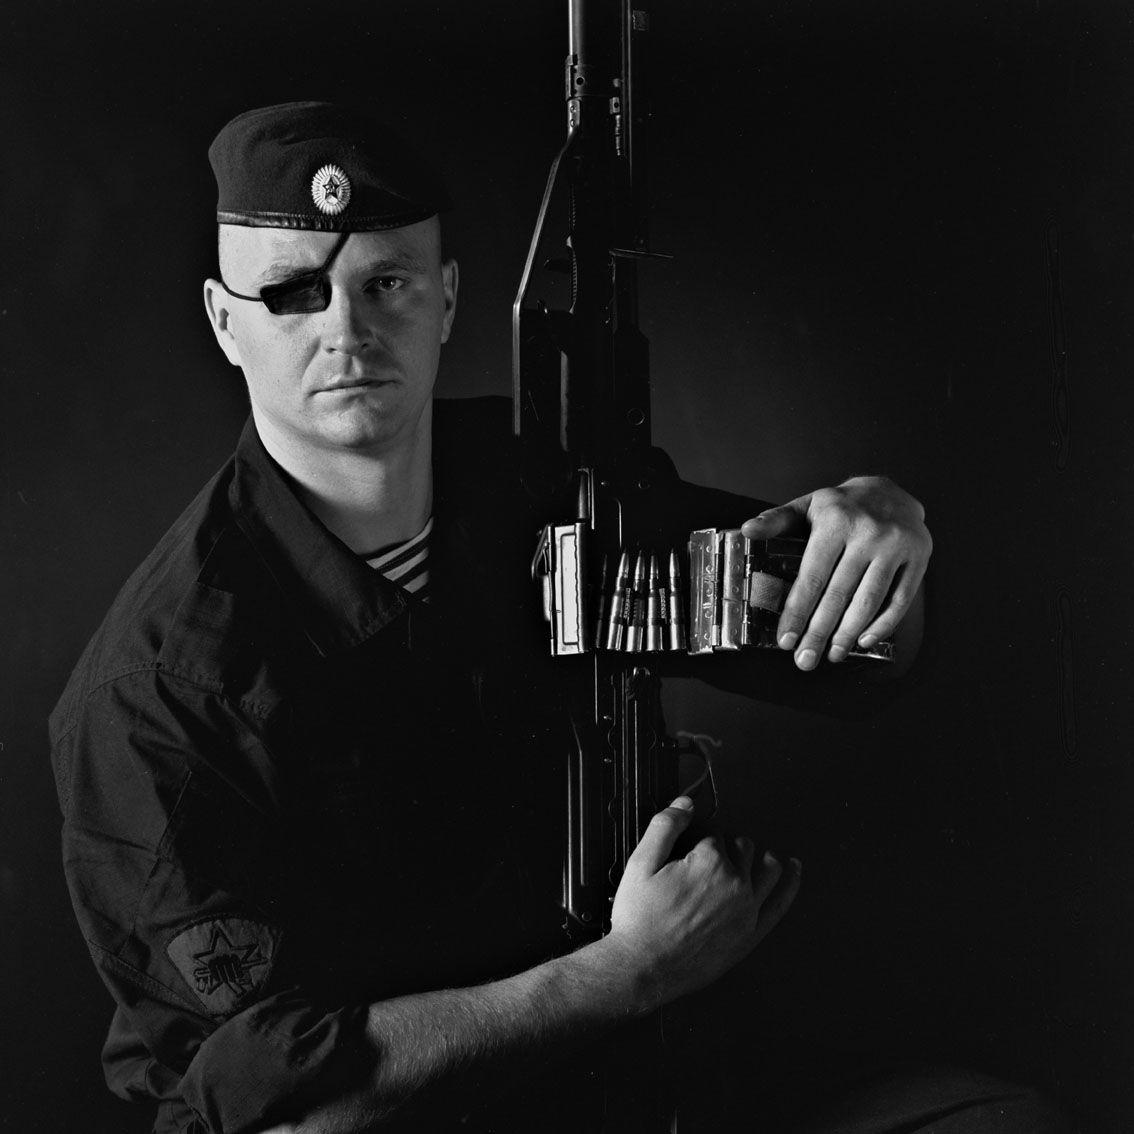 VETERANS OF SPETSNAZ: PORTRAITS OF SECRET SOLDIERS - 8